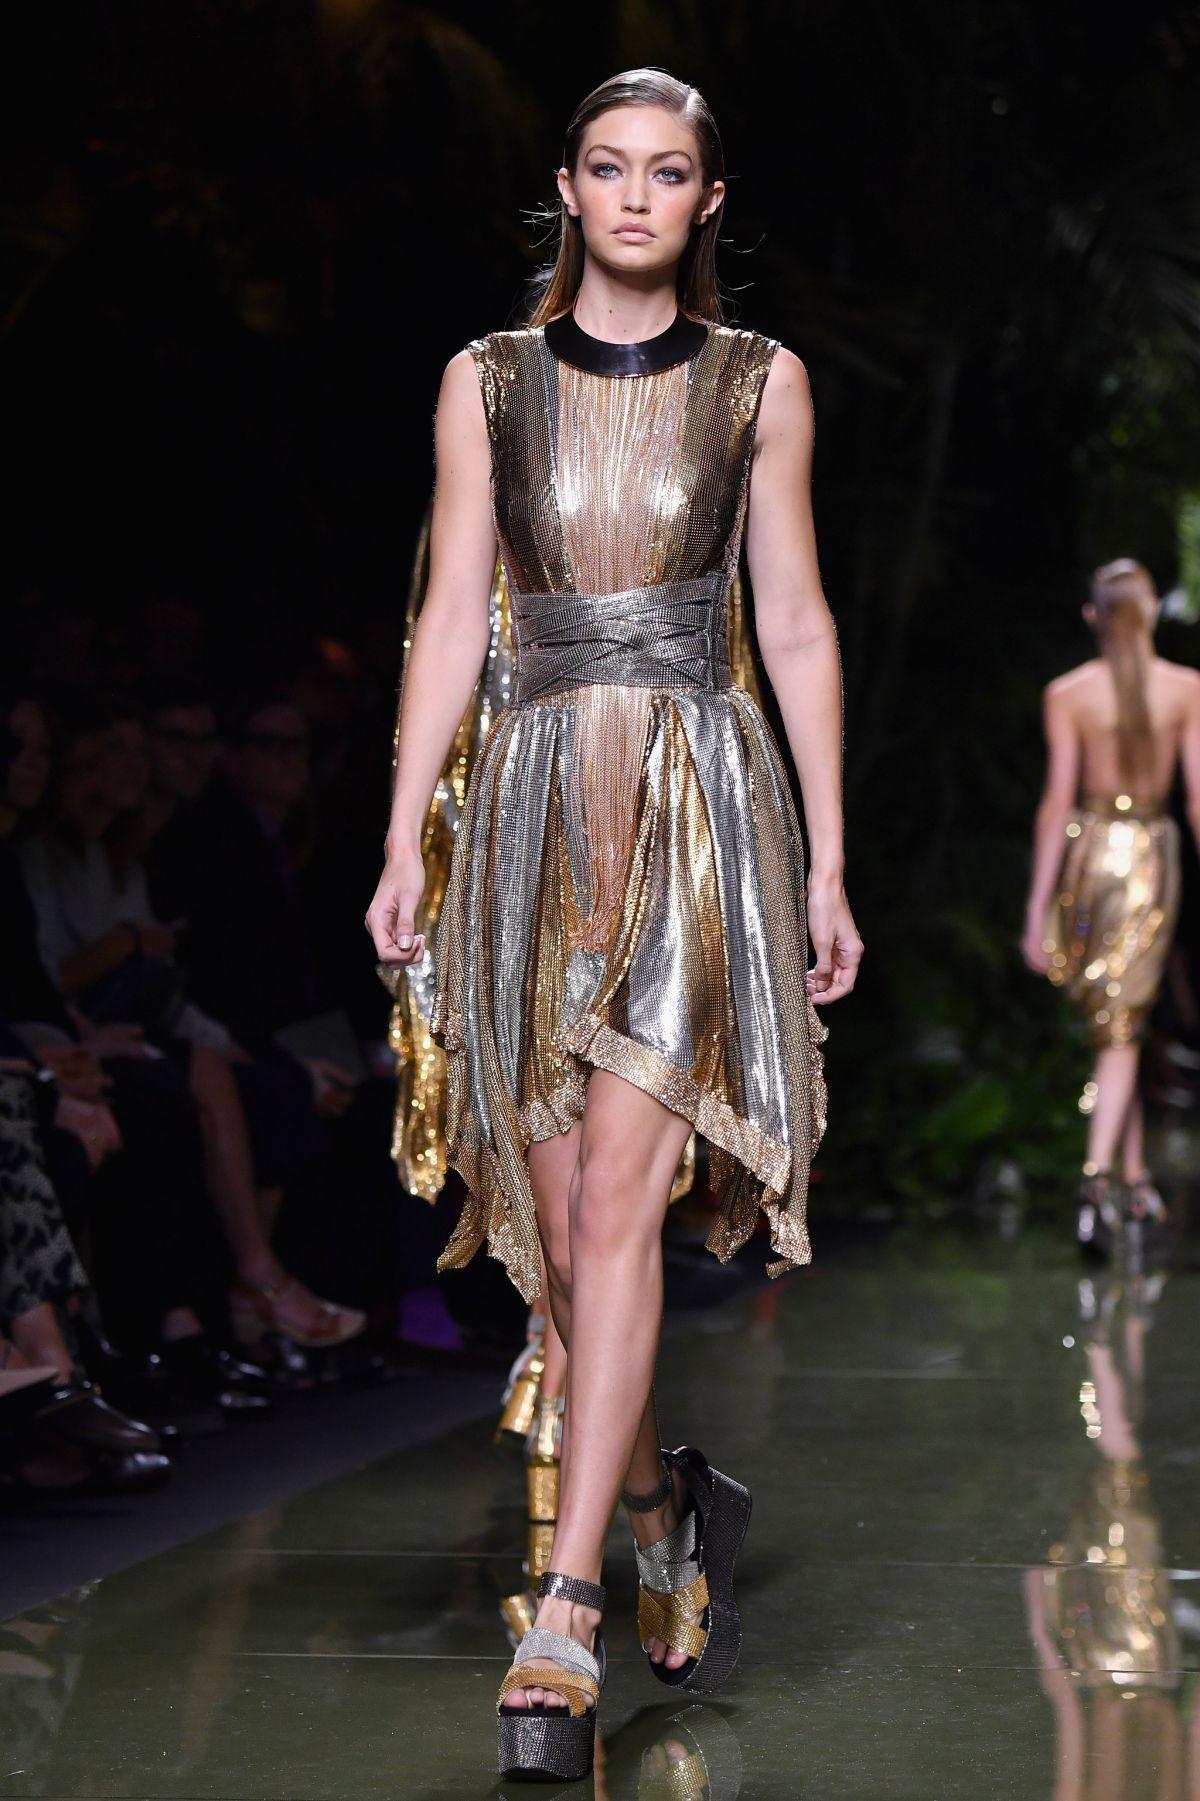 Fashion Week: GIGI HADID At Balmain Fashion Show At Paris Fashion Week